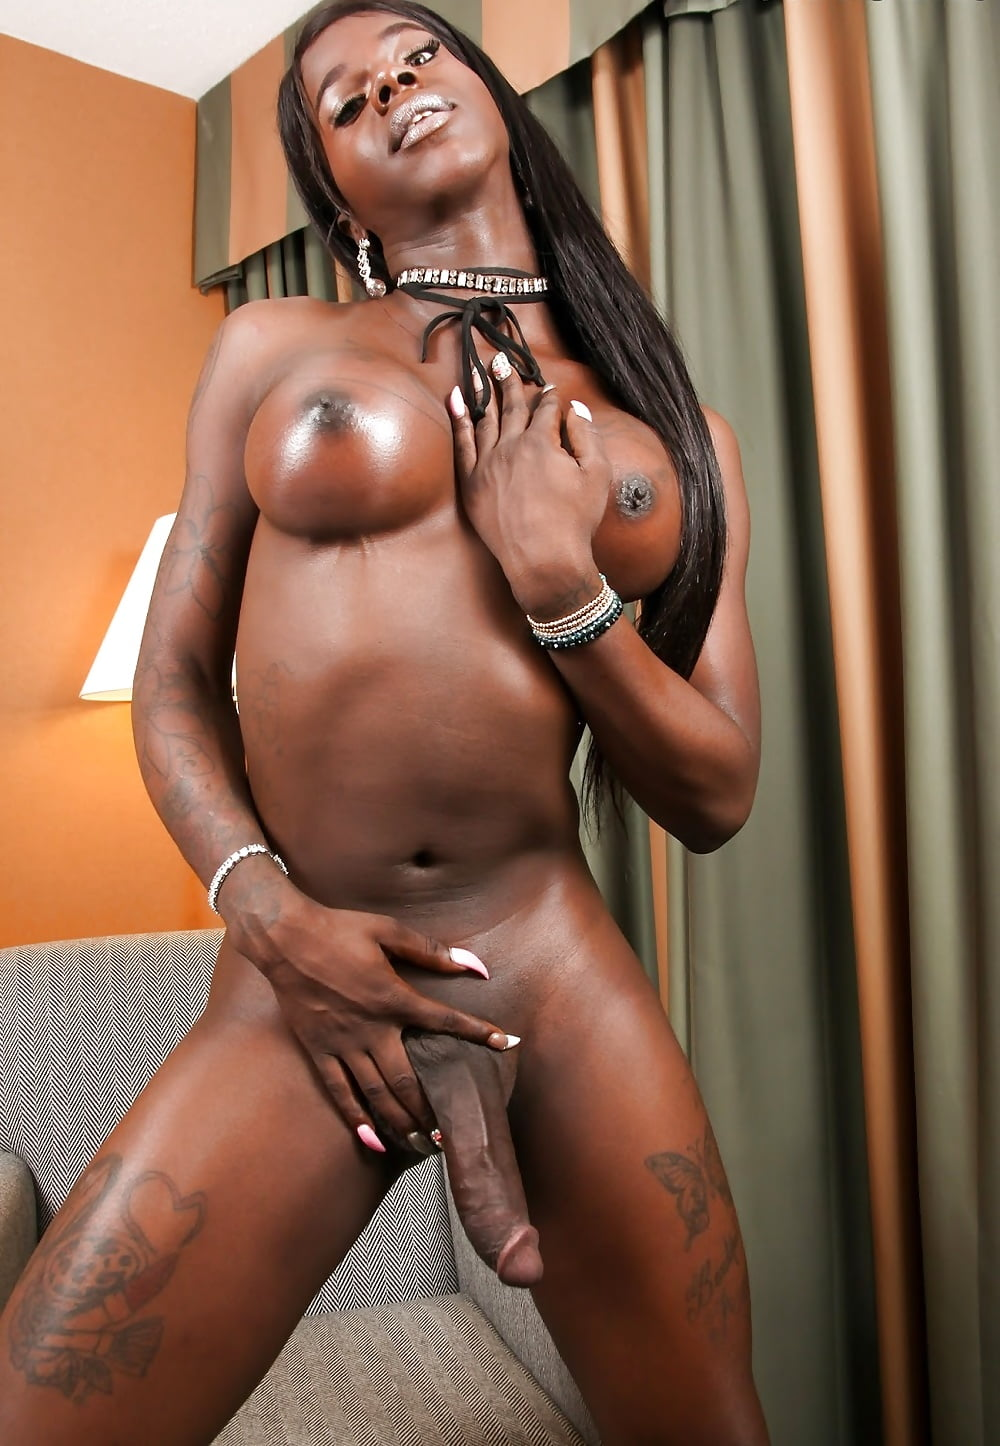 temptress ladyboy chelsea marie and ts morena black bangs hard